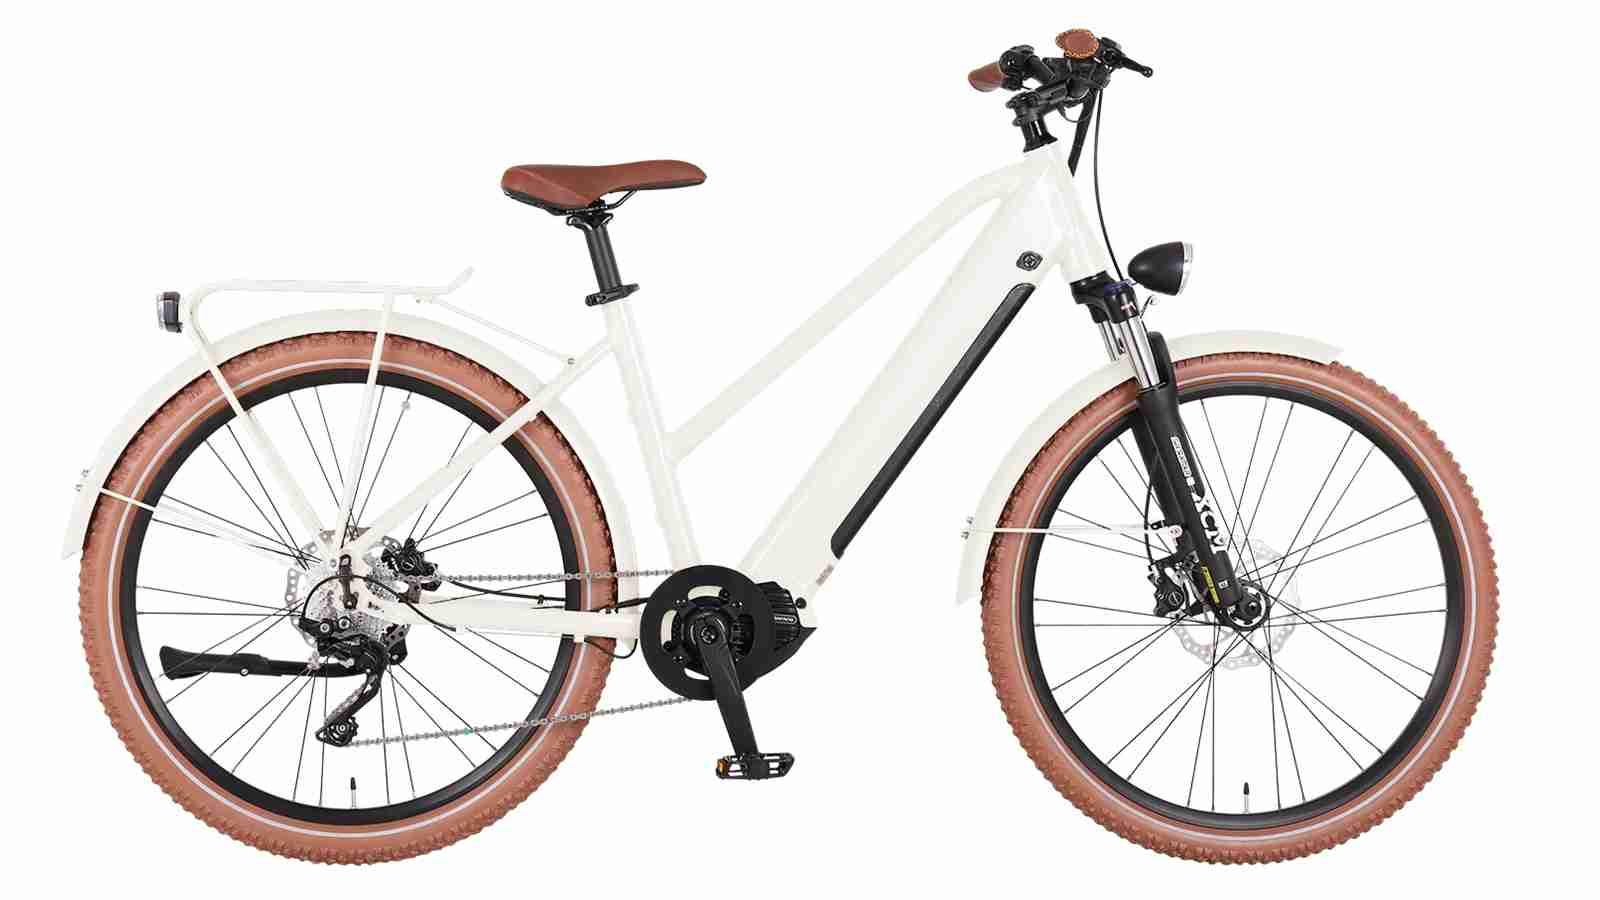 TVS gets majority stake in European e-bike brand EGO Movement